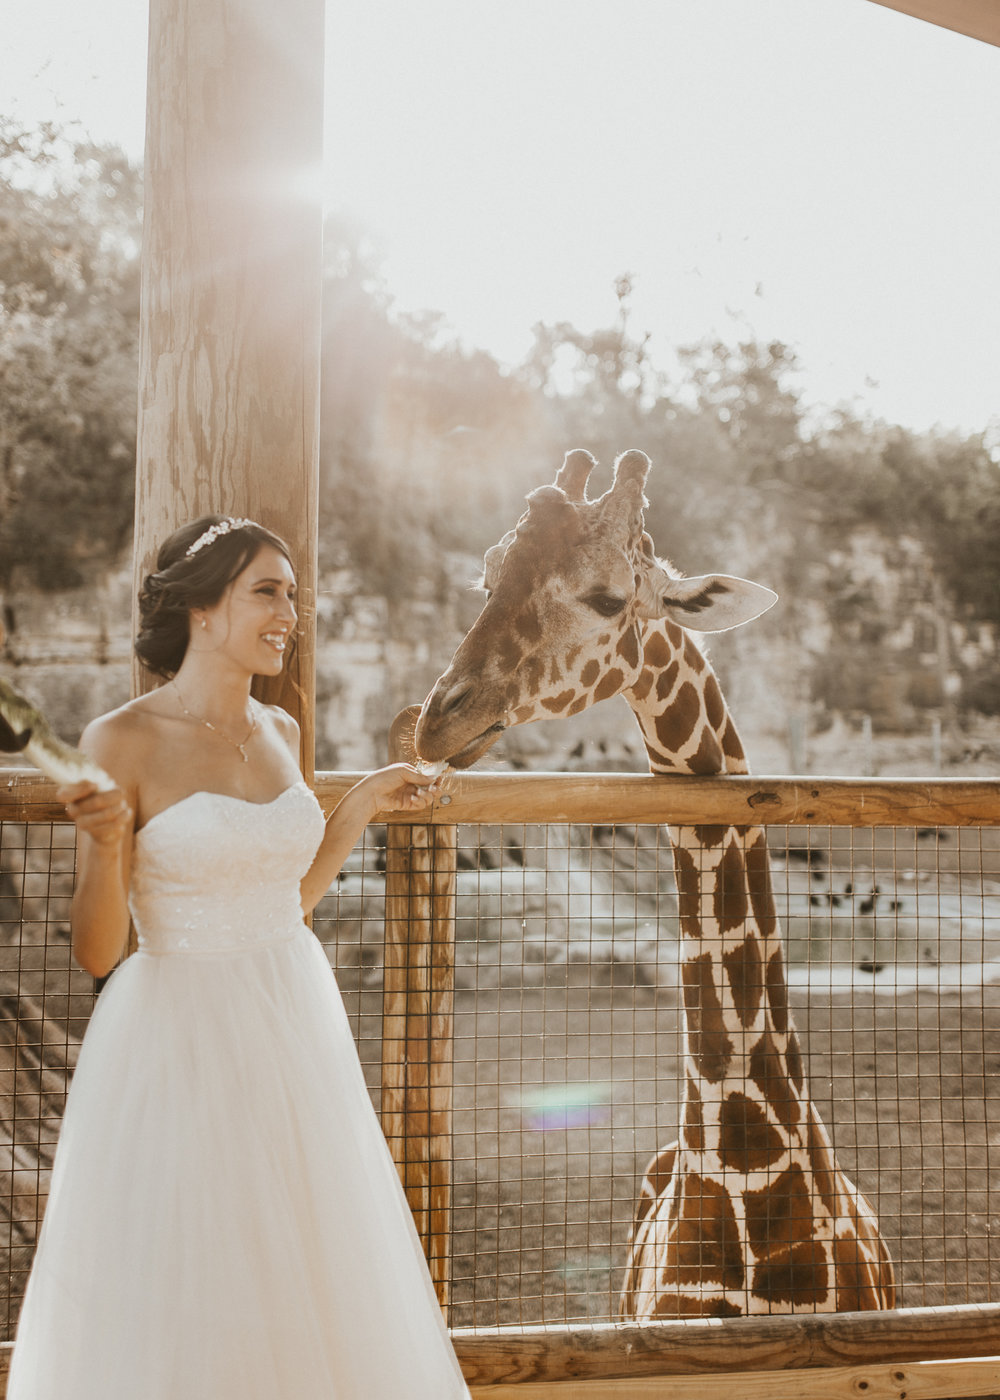 L'Cee_Bridal-19.jpg